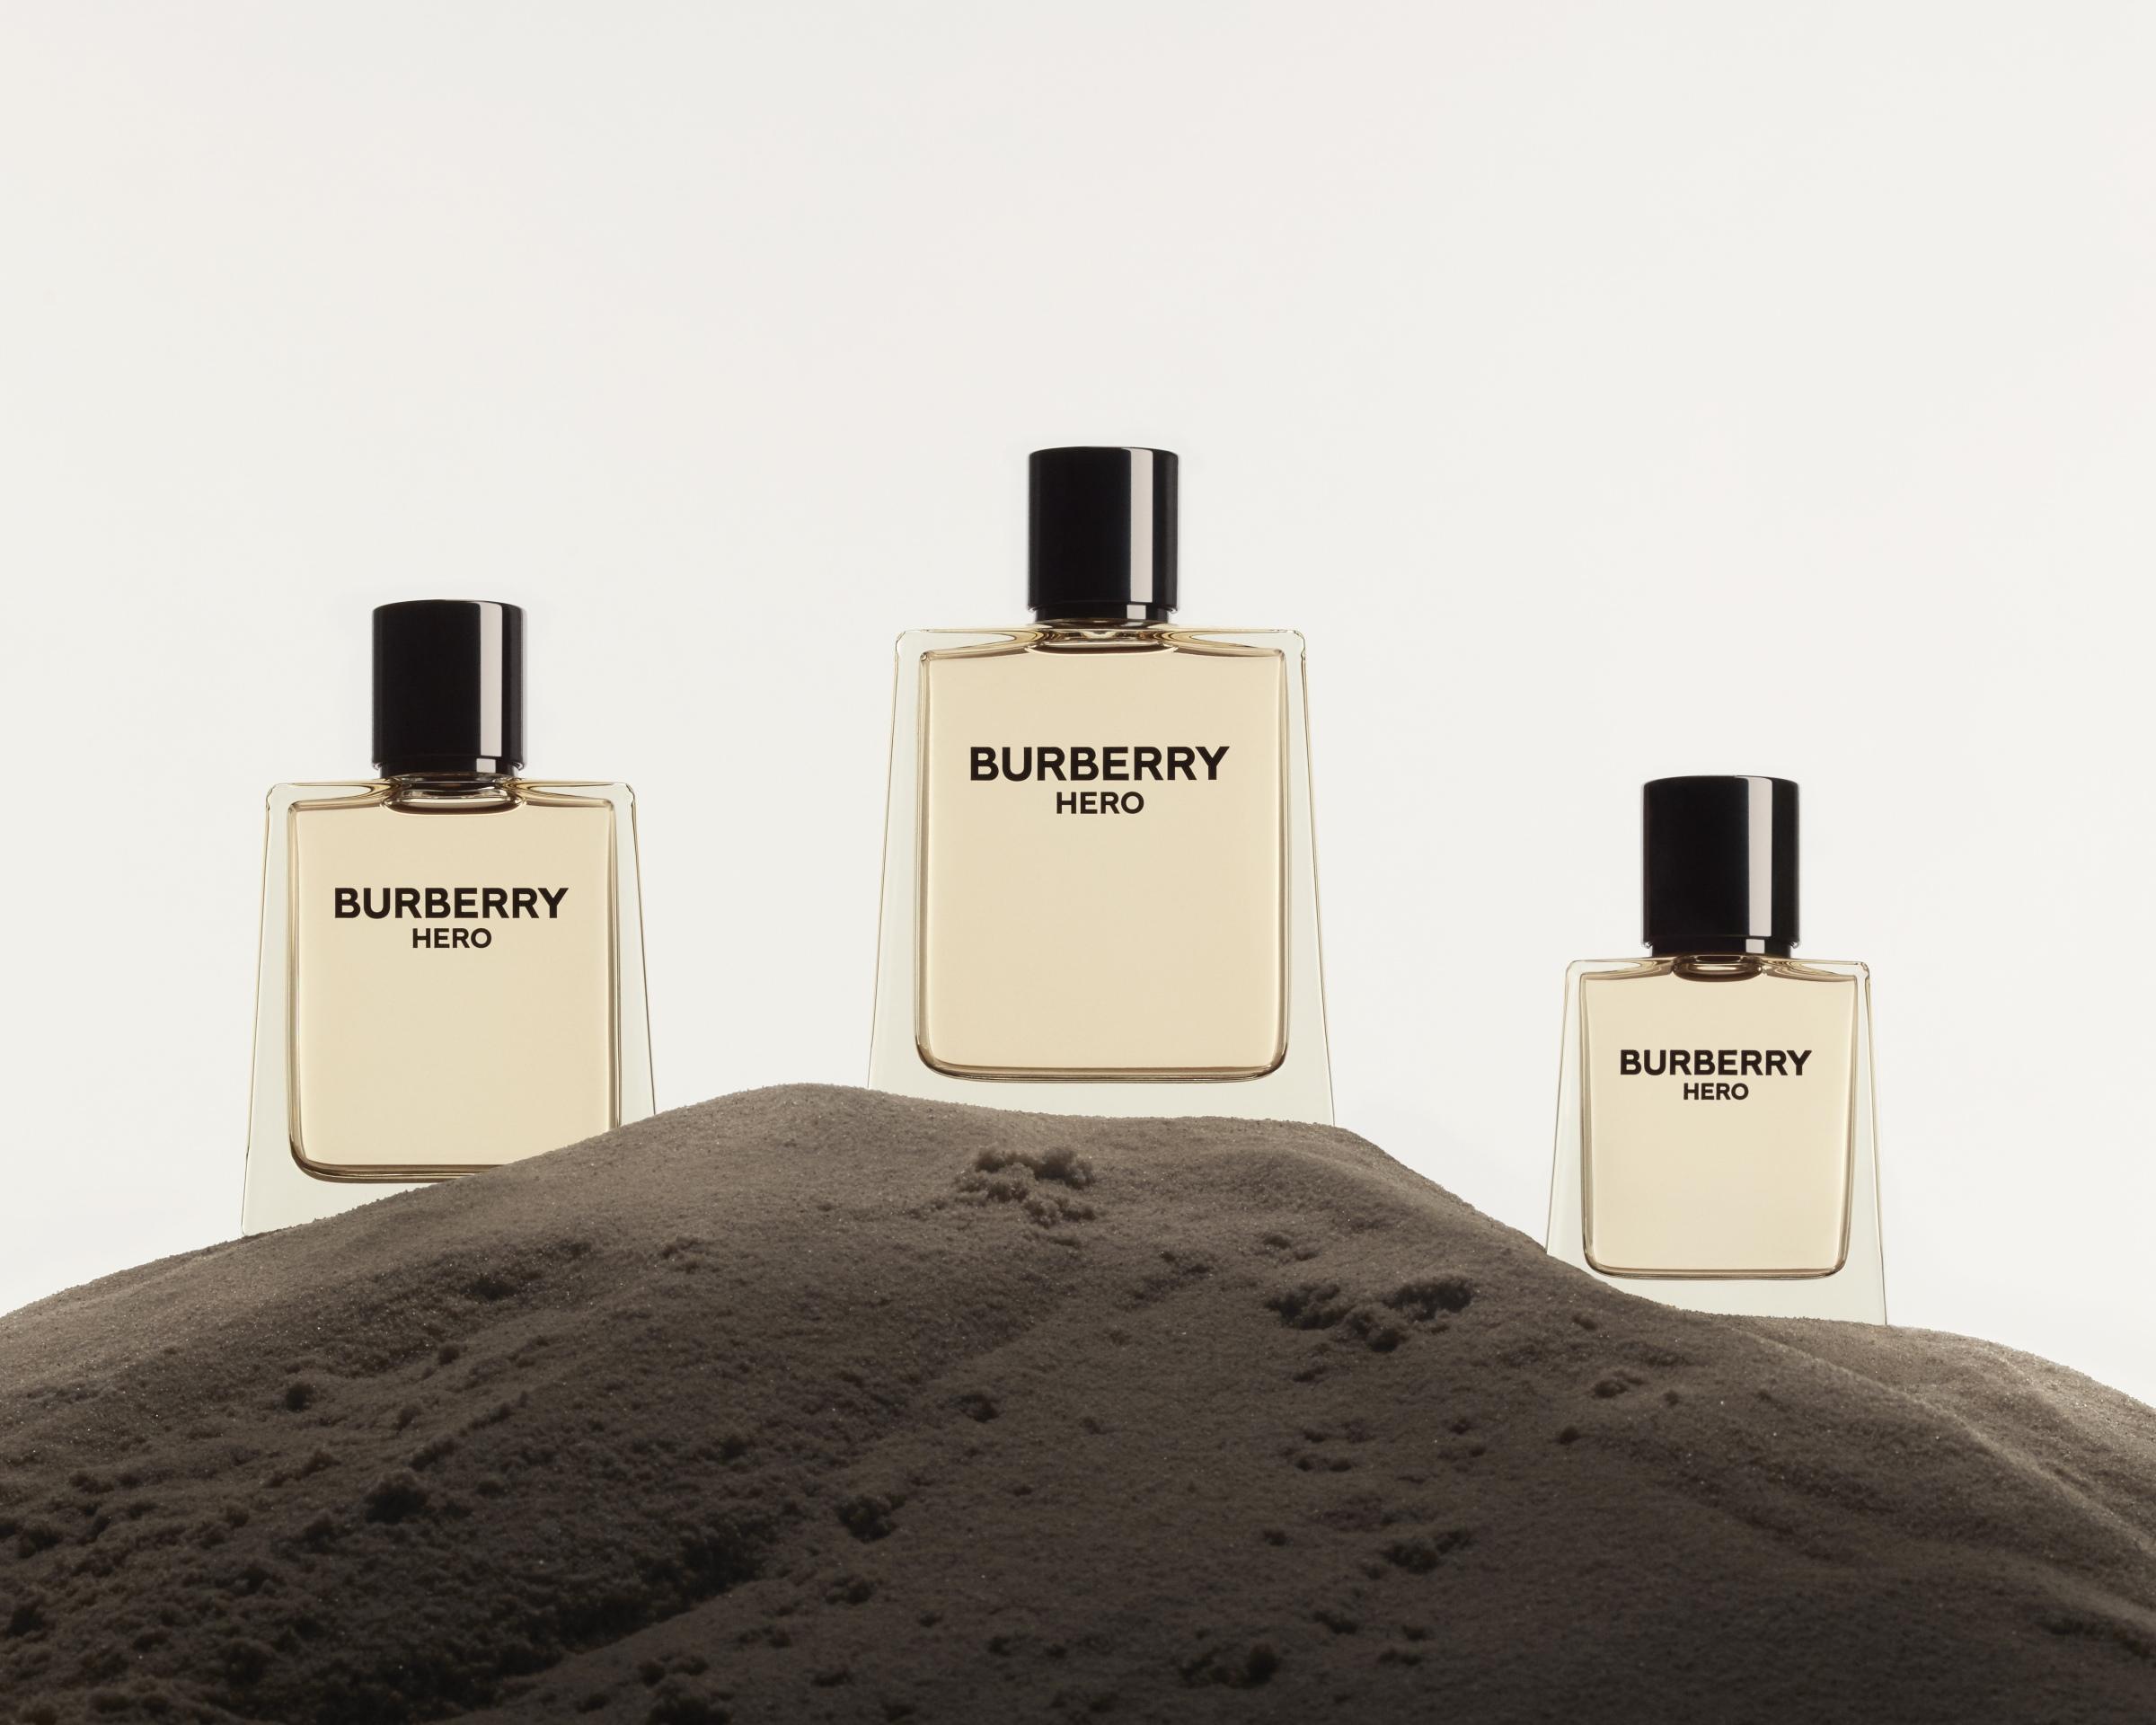 Burberry Reveals Burberry Hero Fragrance For Men